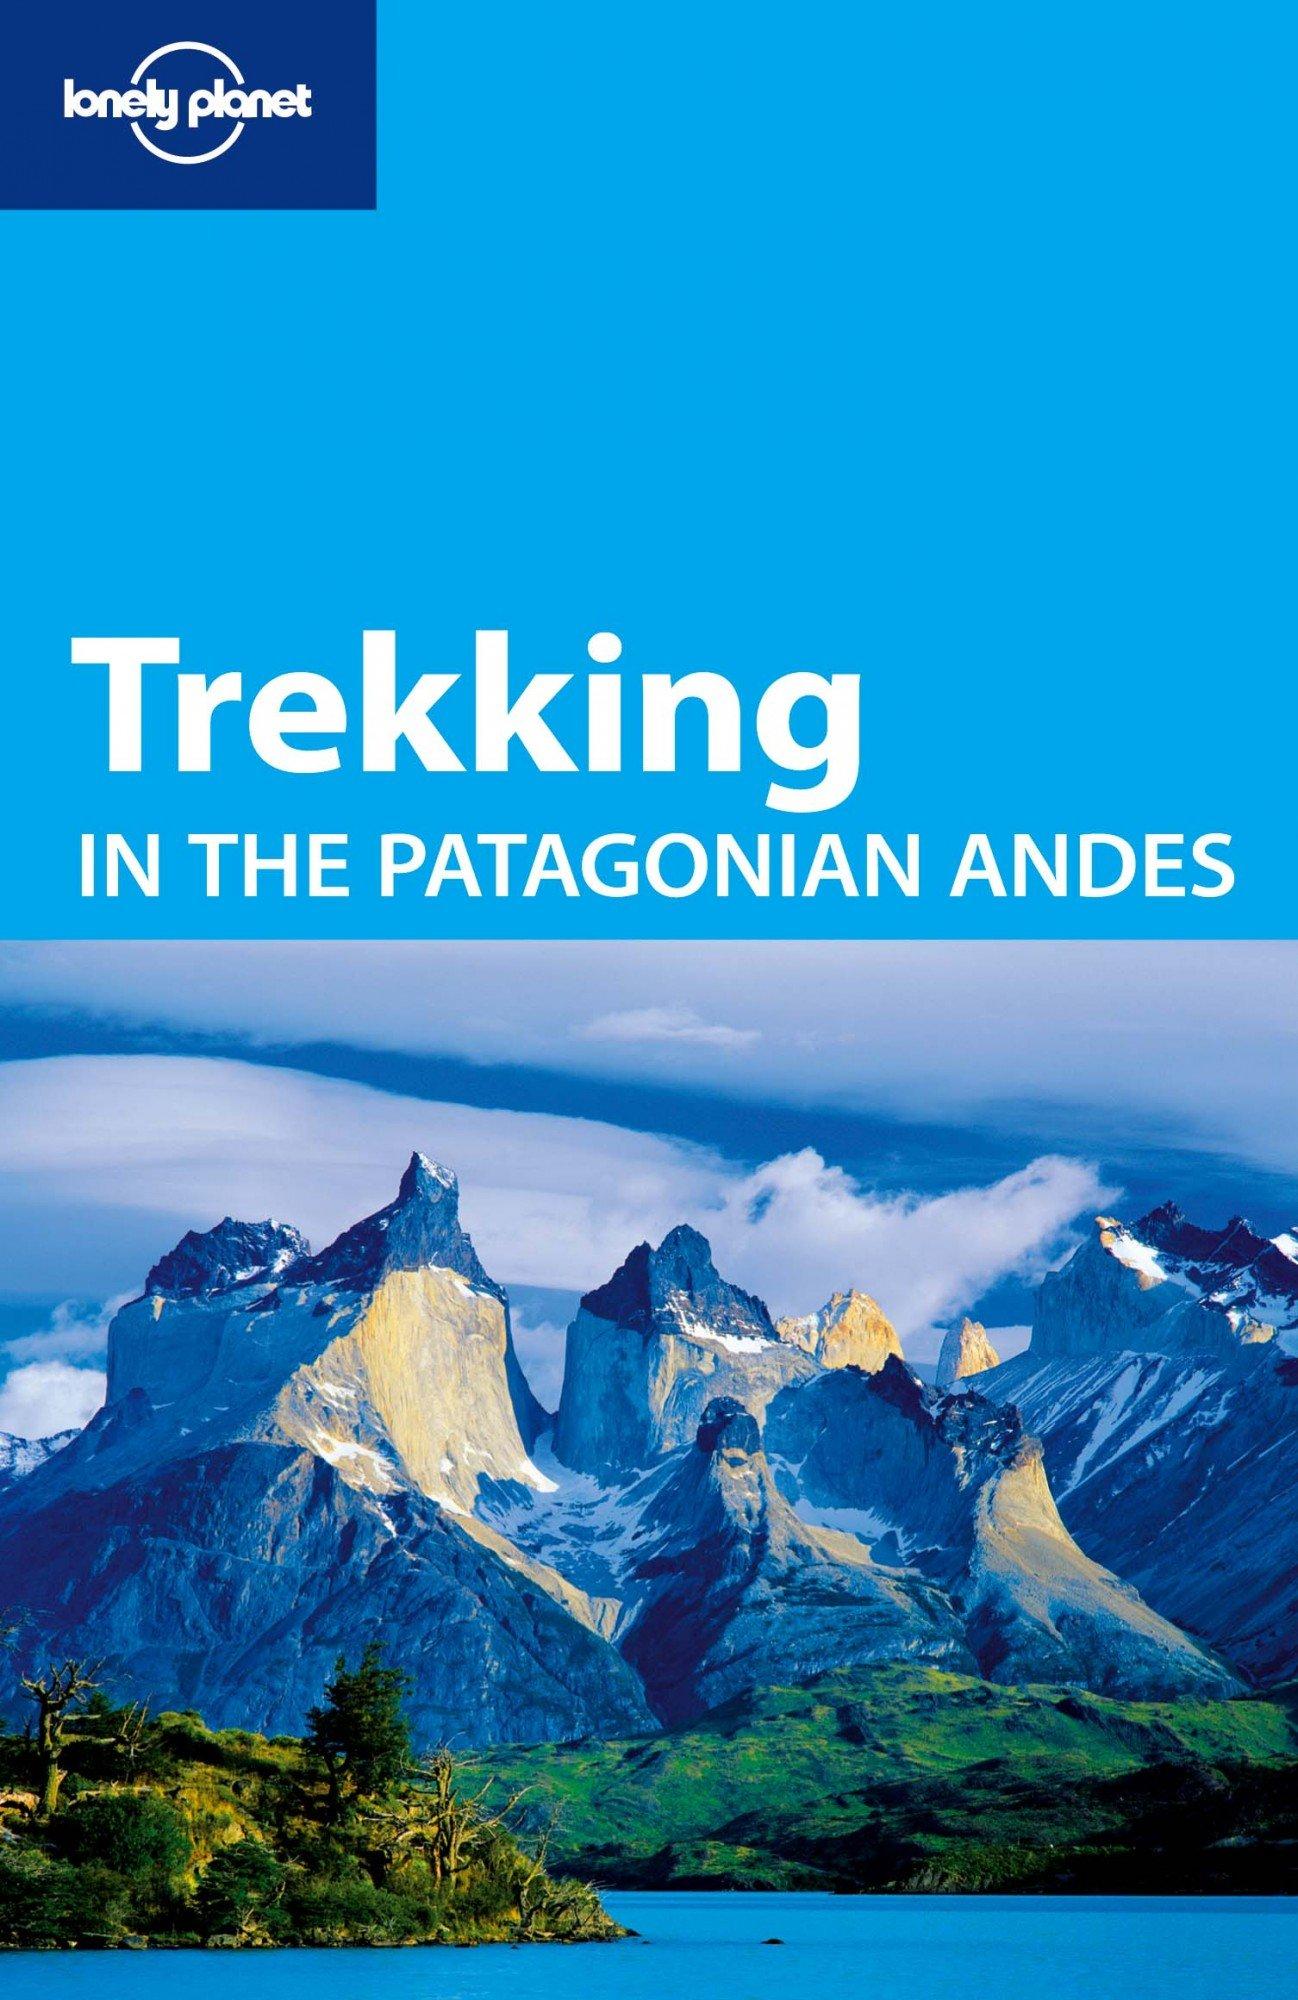 Lonely Planet Trekking Patagonian Travel